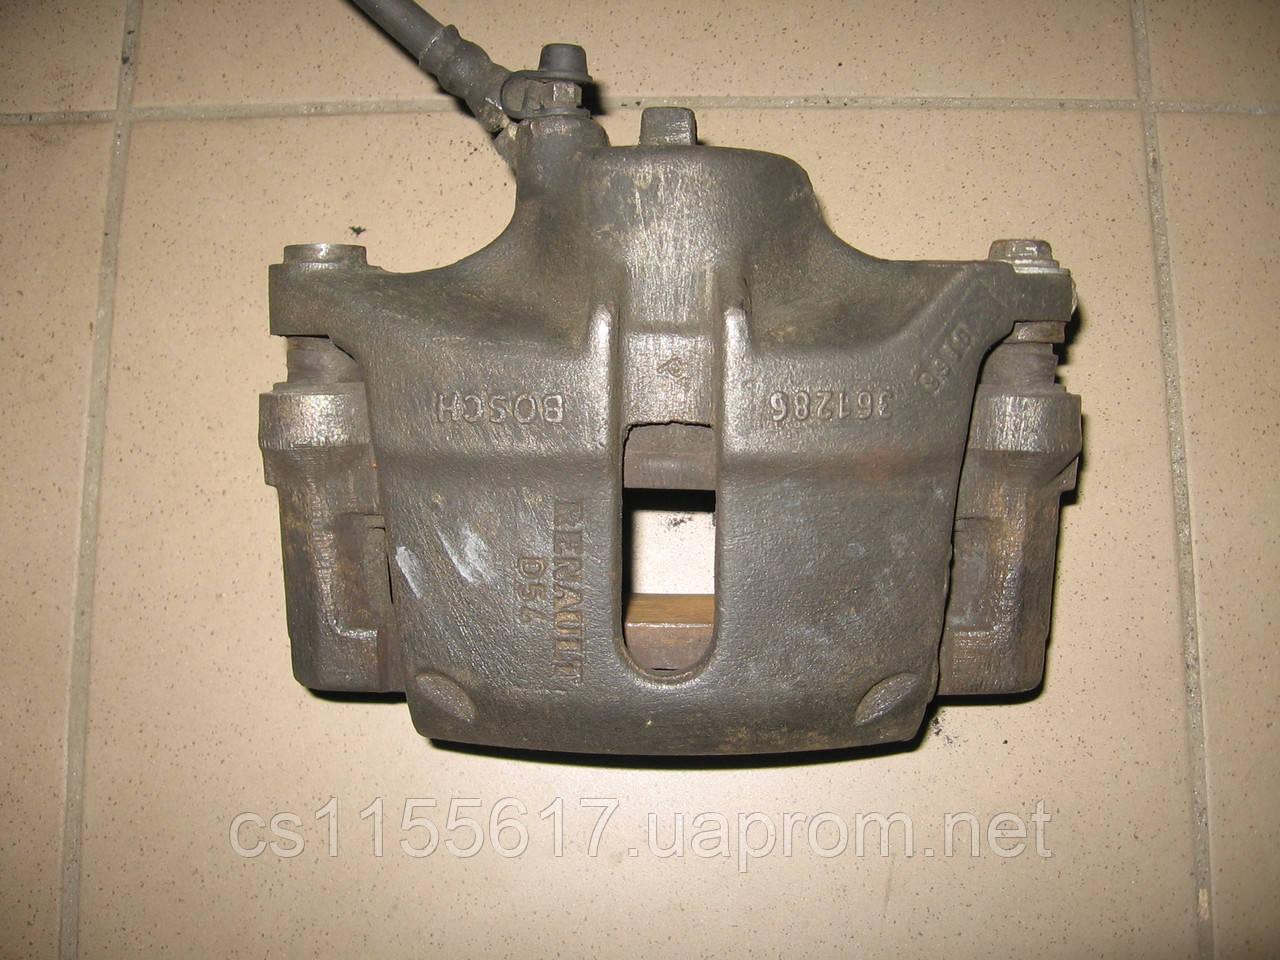 Тормозной суппорт передний правый 7701207787 б/у на Renault Kangoo год 1997-2007 (R14, D=54)